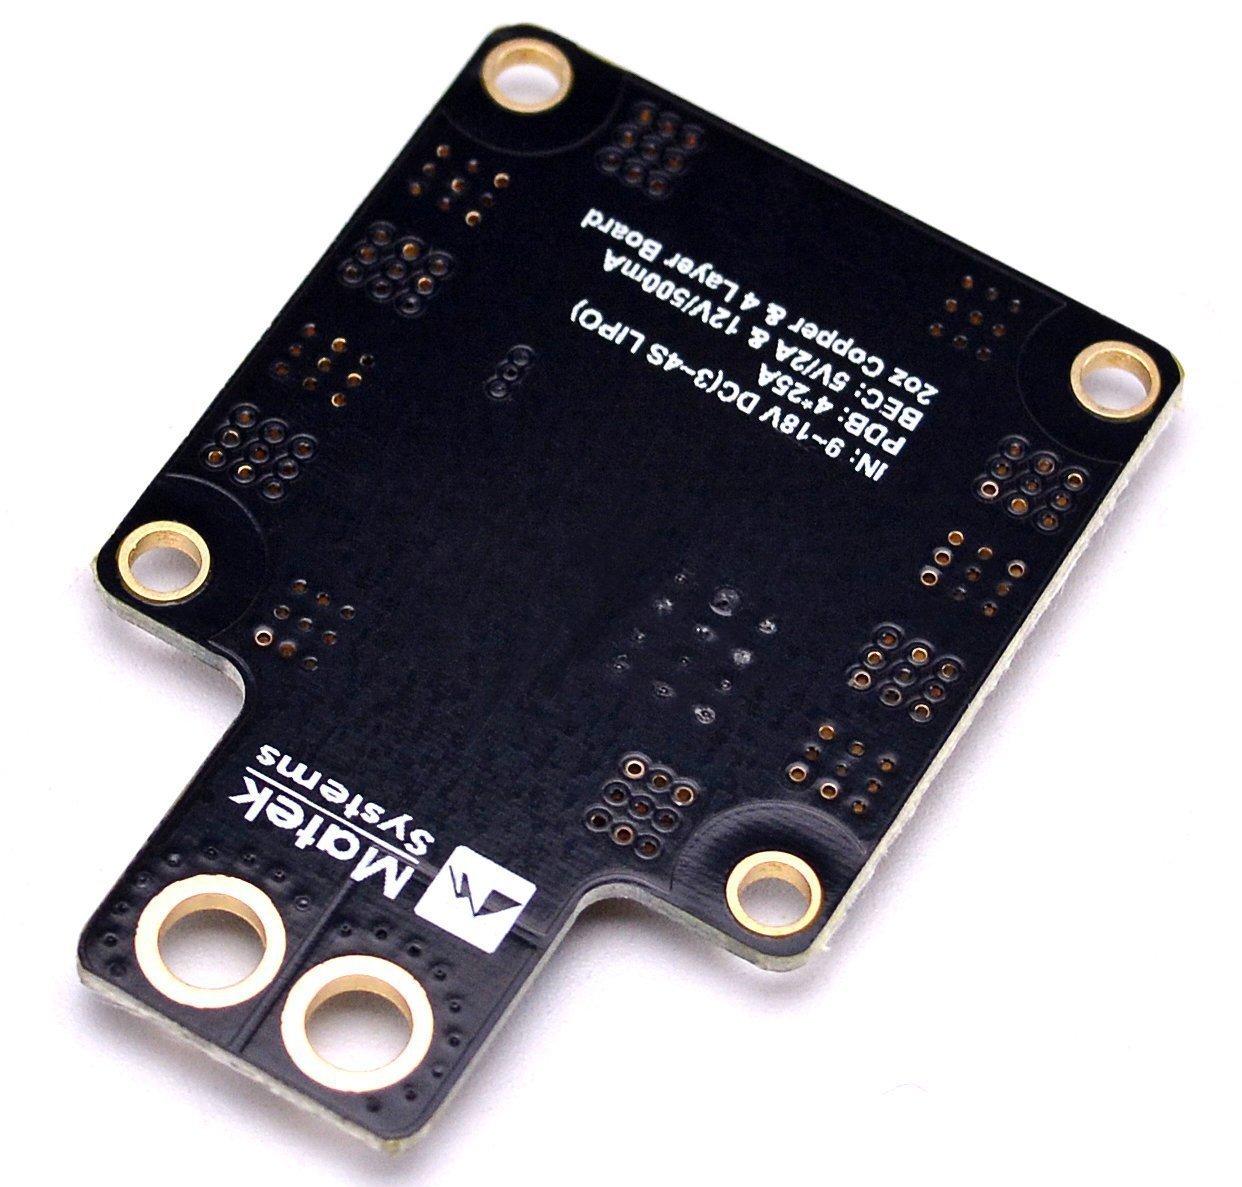 36mm * 36mm Version 3.1 Matek PDB Mini Power Distribution Board 5V ...